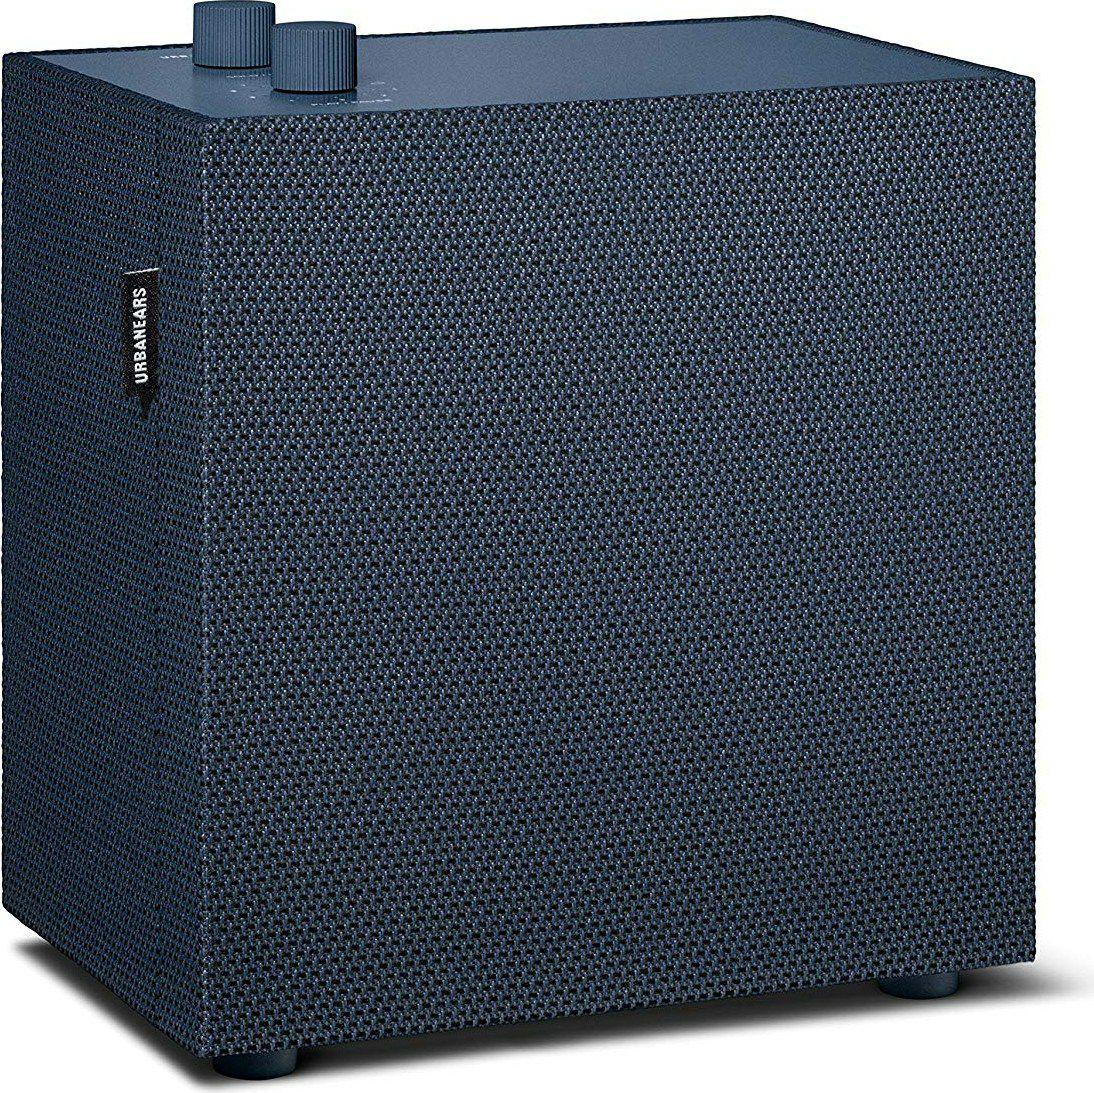 Urbanears Lotsen - Multiroom Lautsprecher (WiFi, Bluetooth 4.2, AirPlay, Spotify Connect, 3.5mm Input)